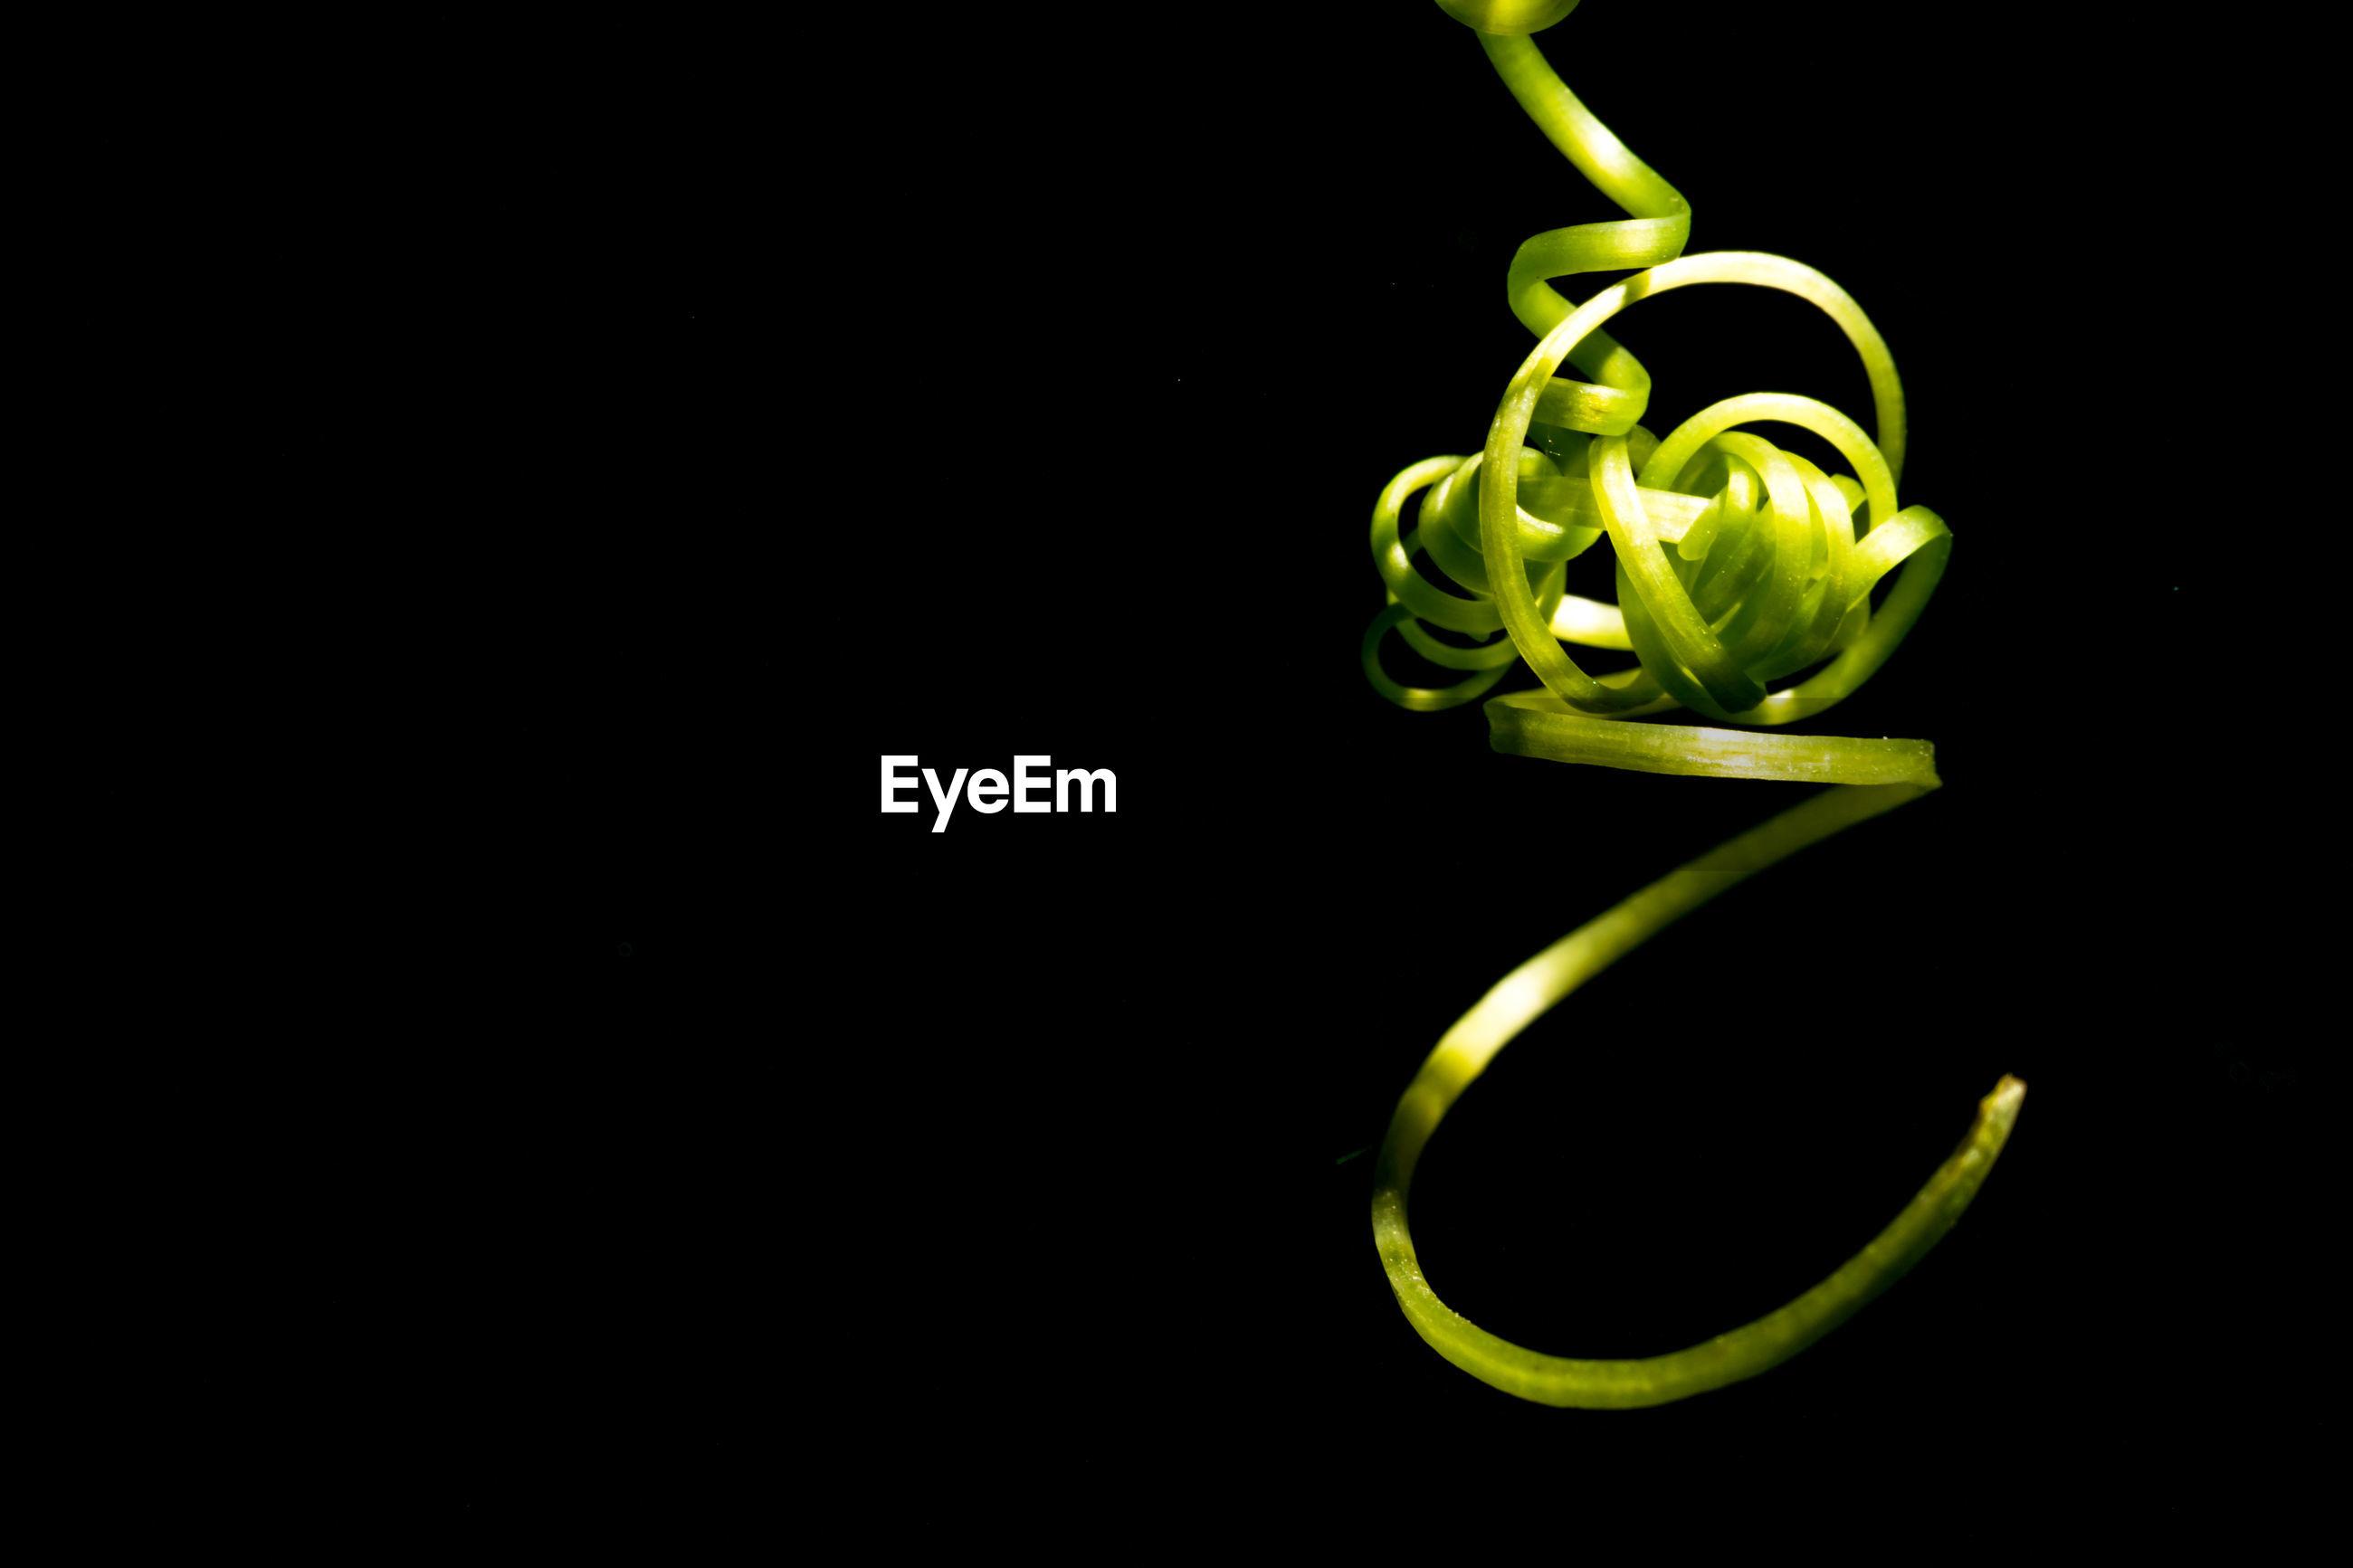 Close-up of vine tendril against black background